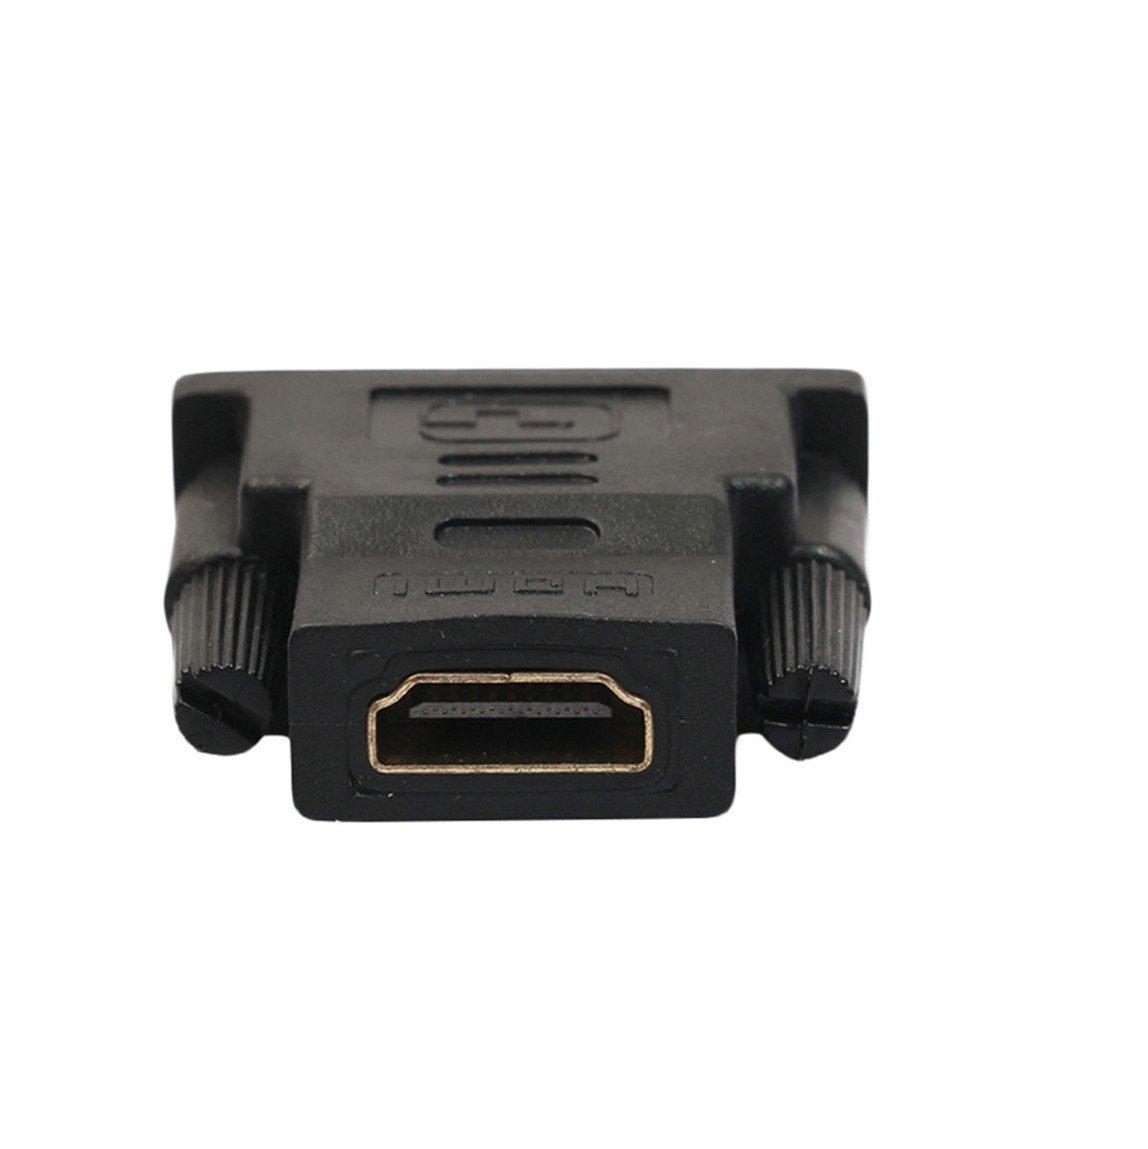 Sky & # x2605; & # x2605; geflochten HDMI + DVI: Amazon.de: Elektronik